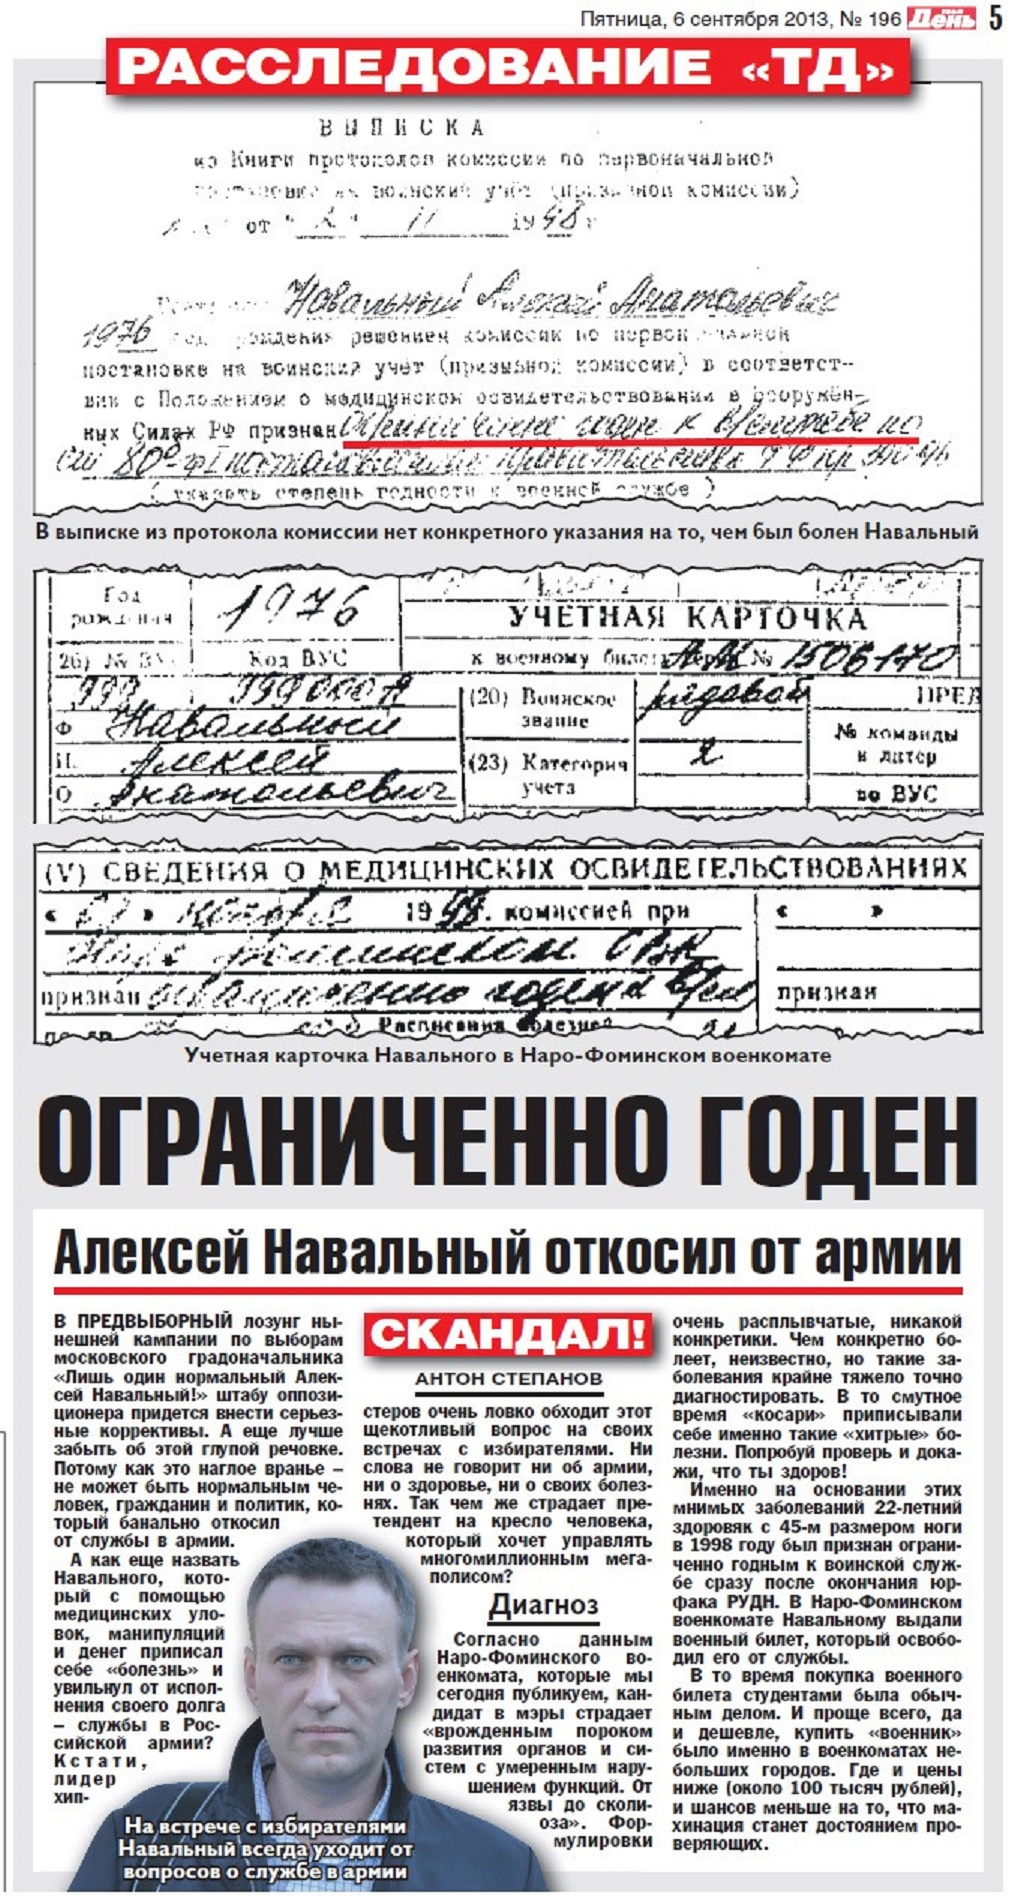 навальный откосил.jpg